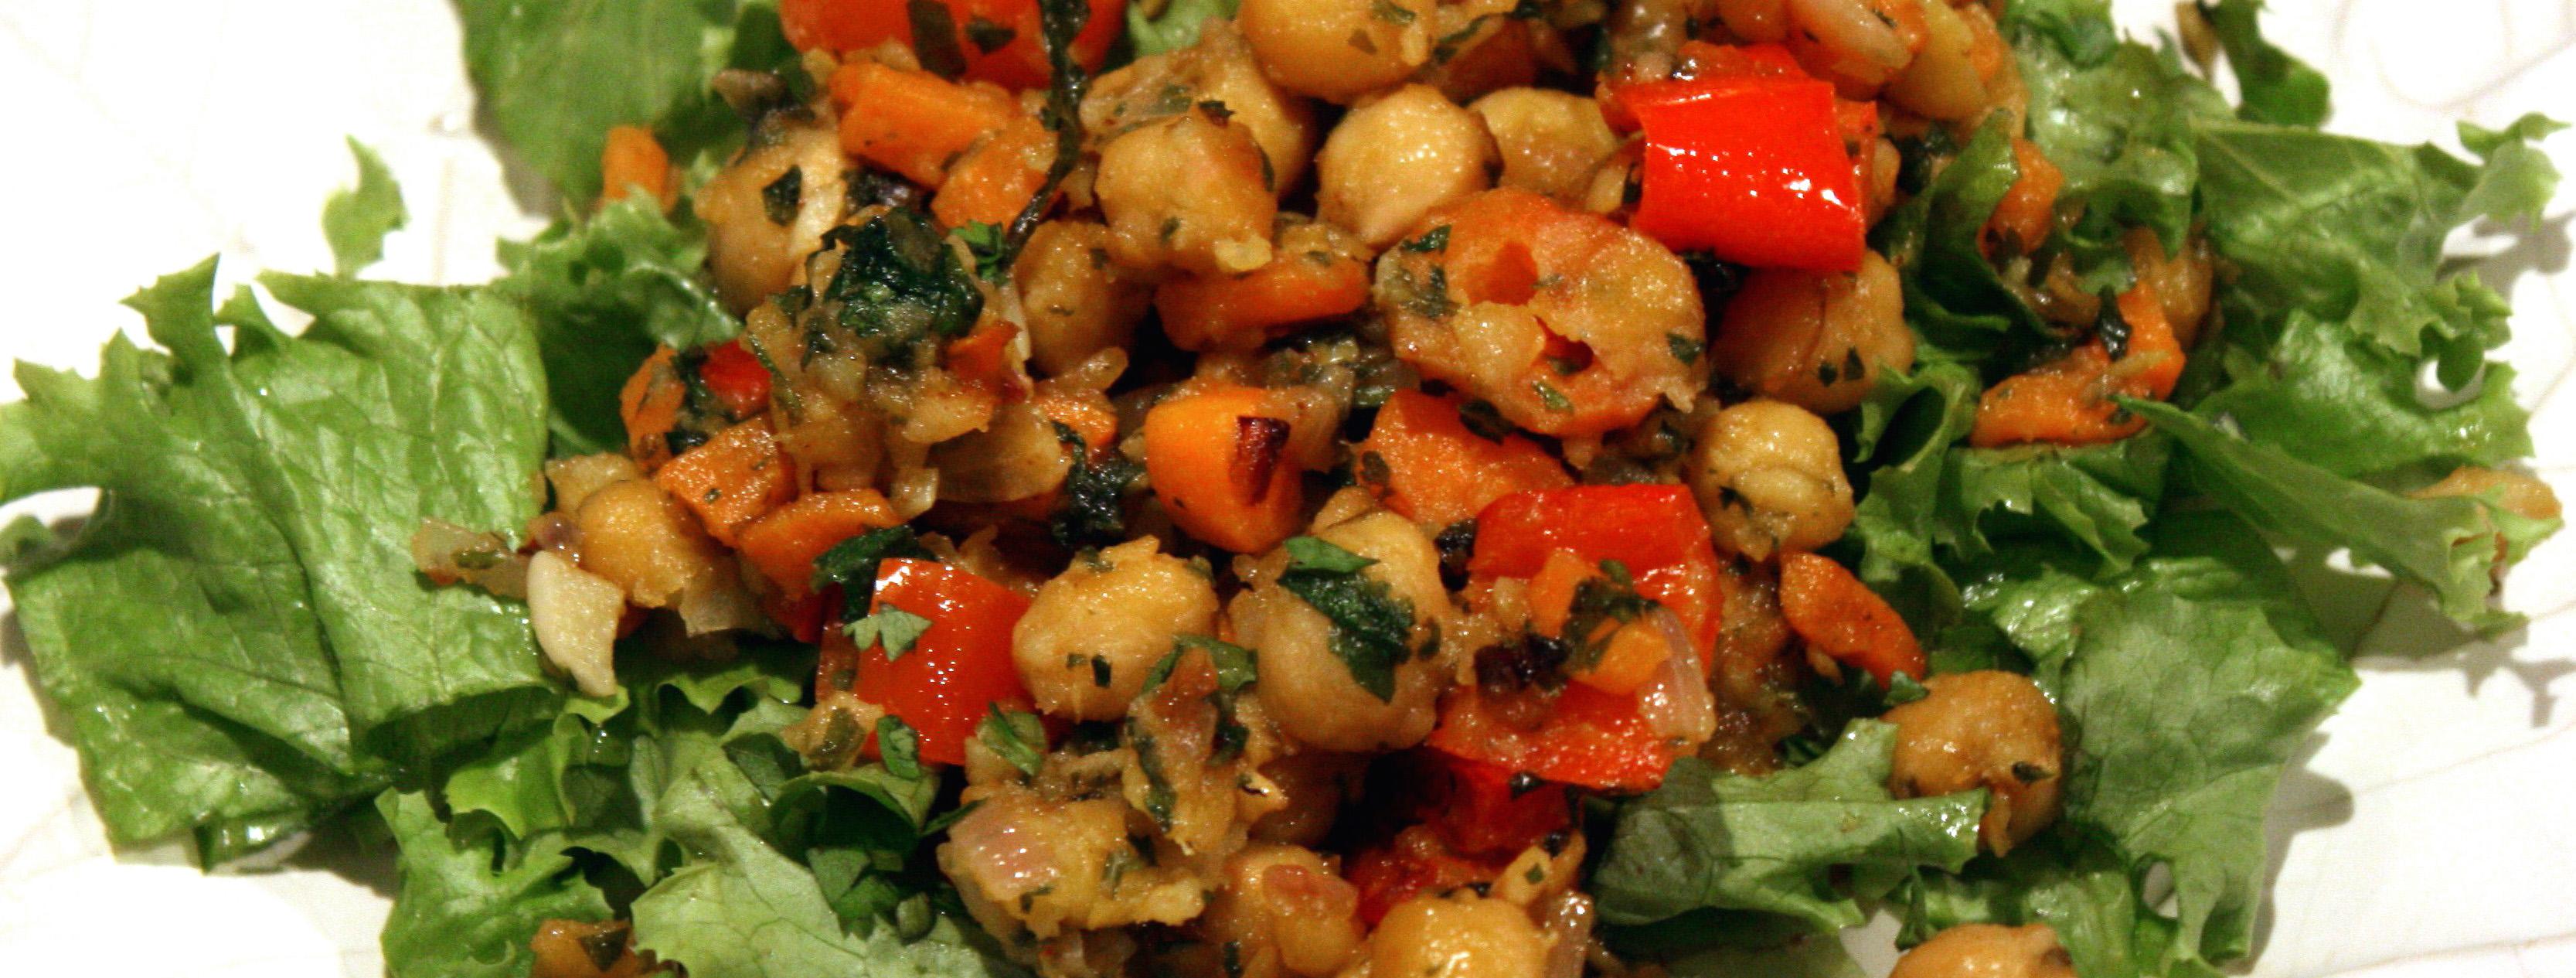 Lemony Chickpea Stir-fry Recipe — Dishmaps